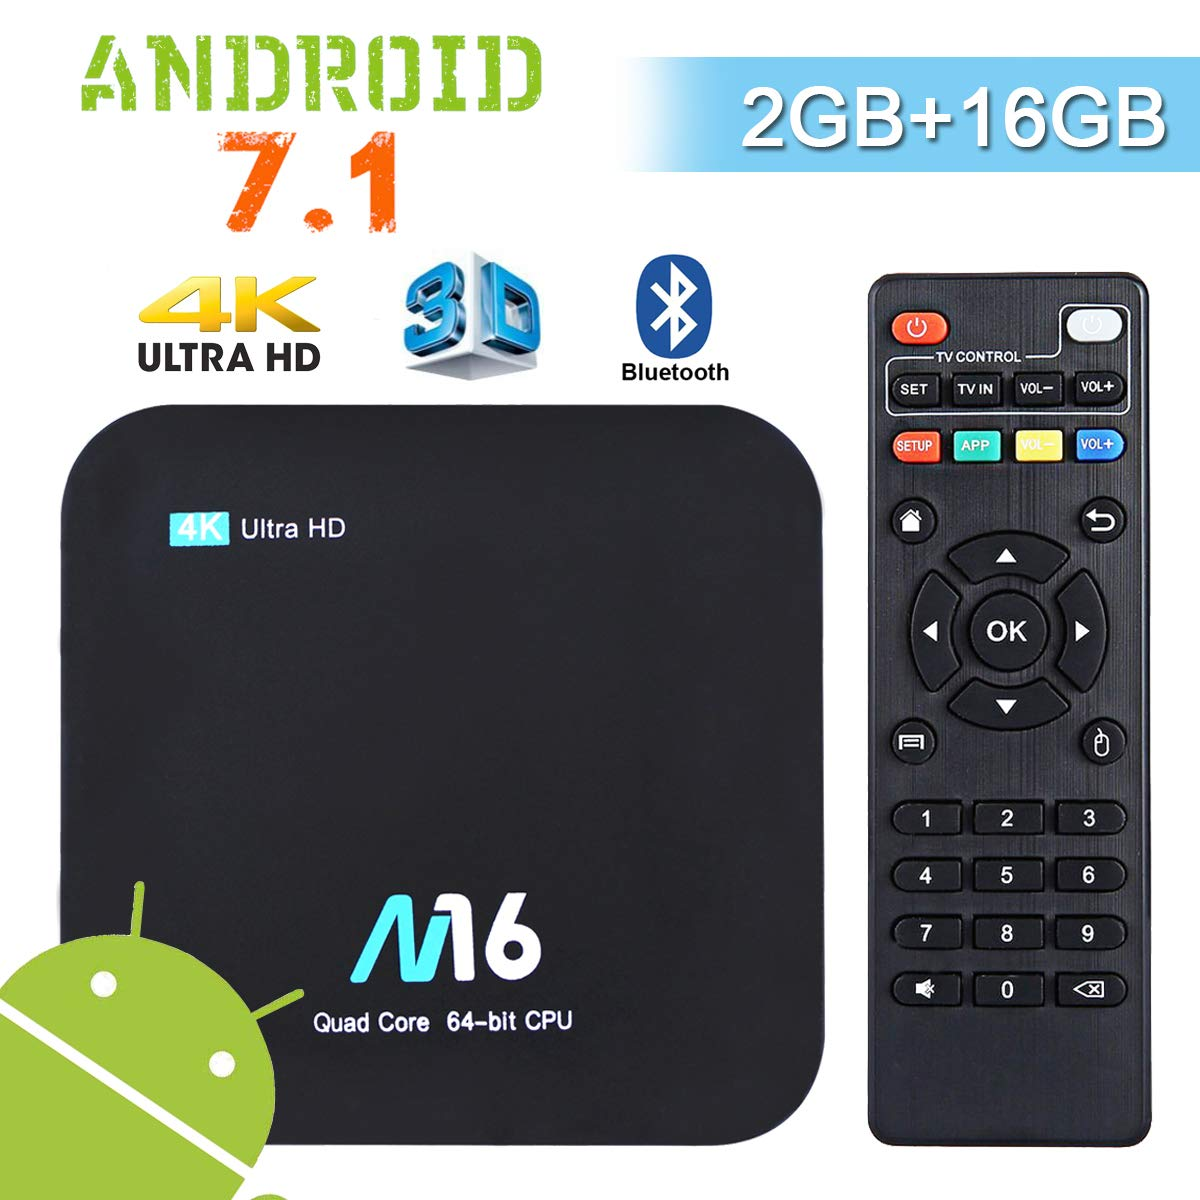 Android TV Box 4K - Wesho Android 7.1 Smart TV Box de 2GB RAM+16GB